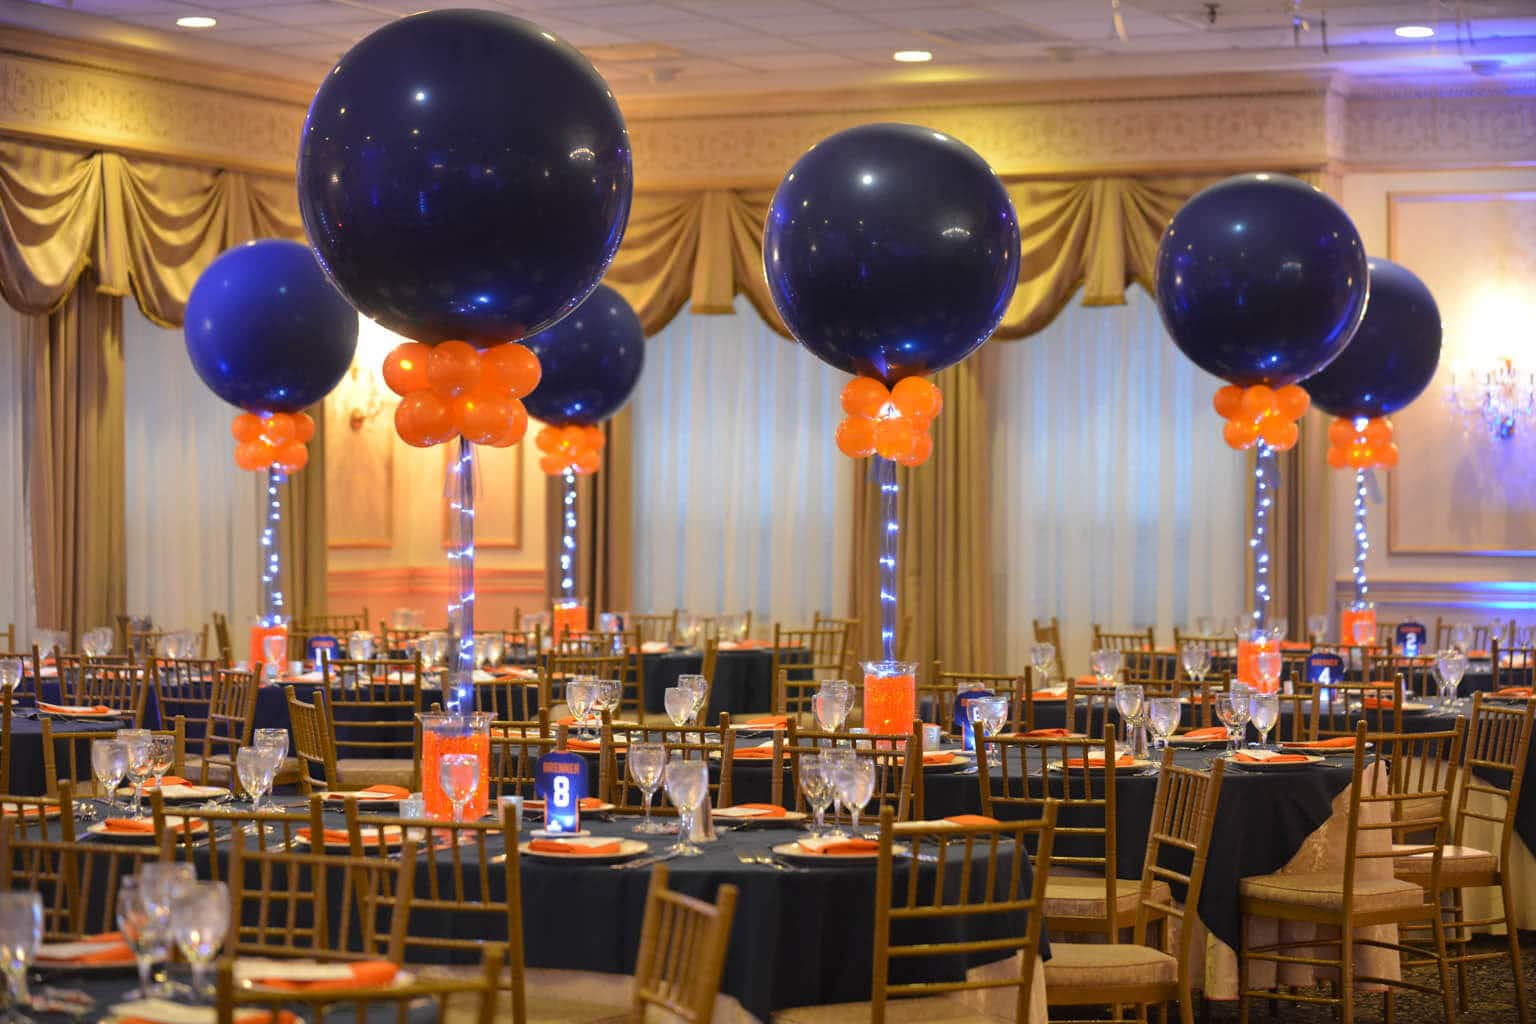 Aqua Gems Centerpieces Balloon Artistry